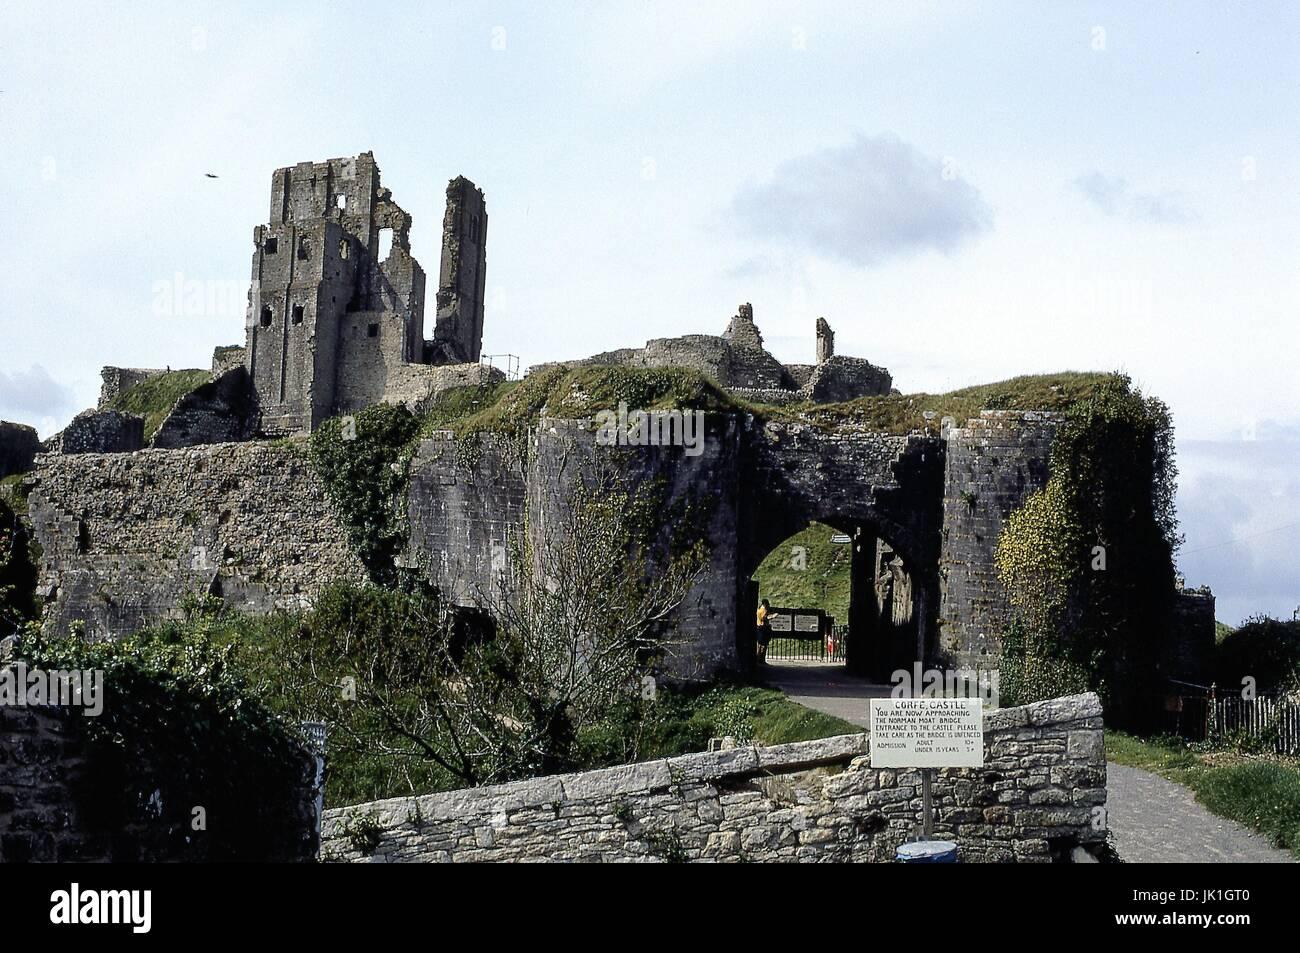 Corfe Castle, Dorset 1973 - Stock Image